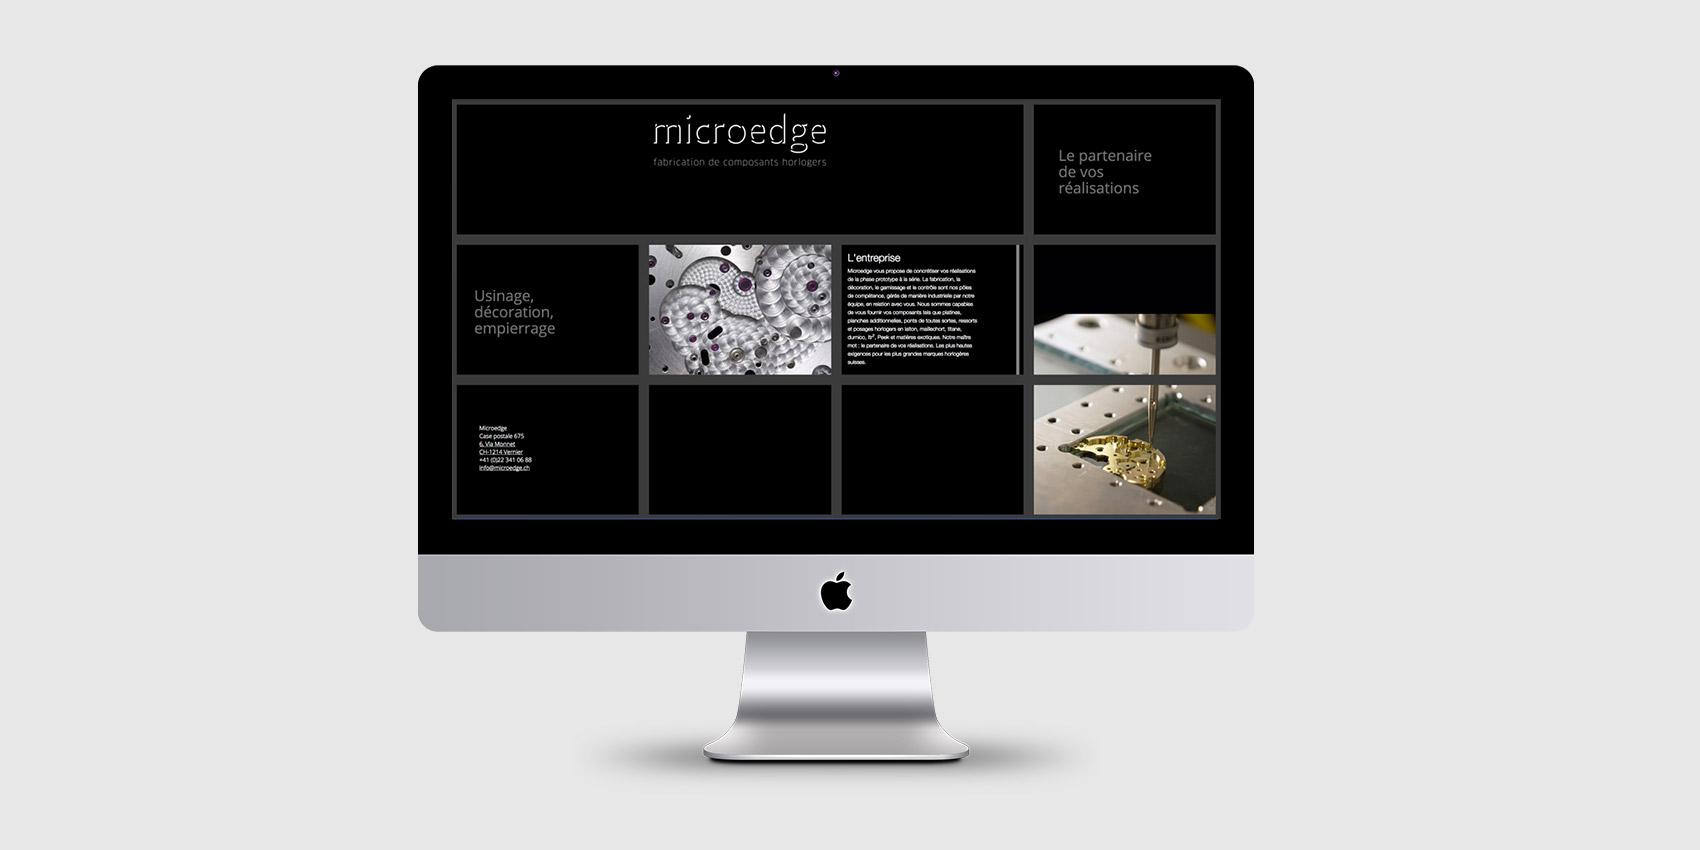 Microedge - Webdesign - B12communication, communication et graphisme